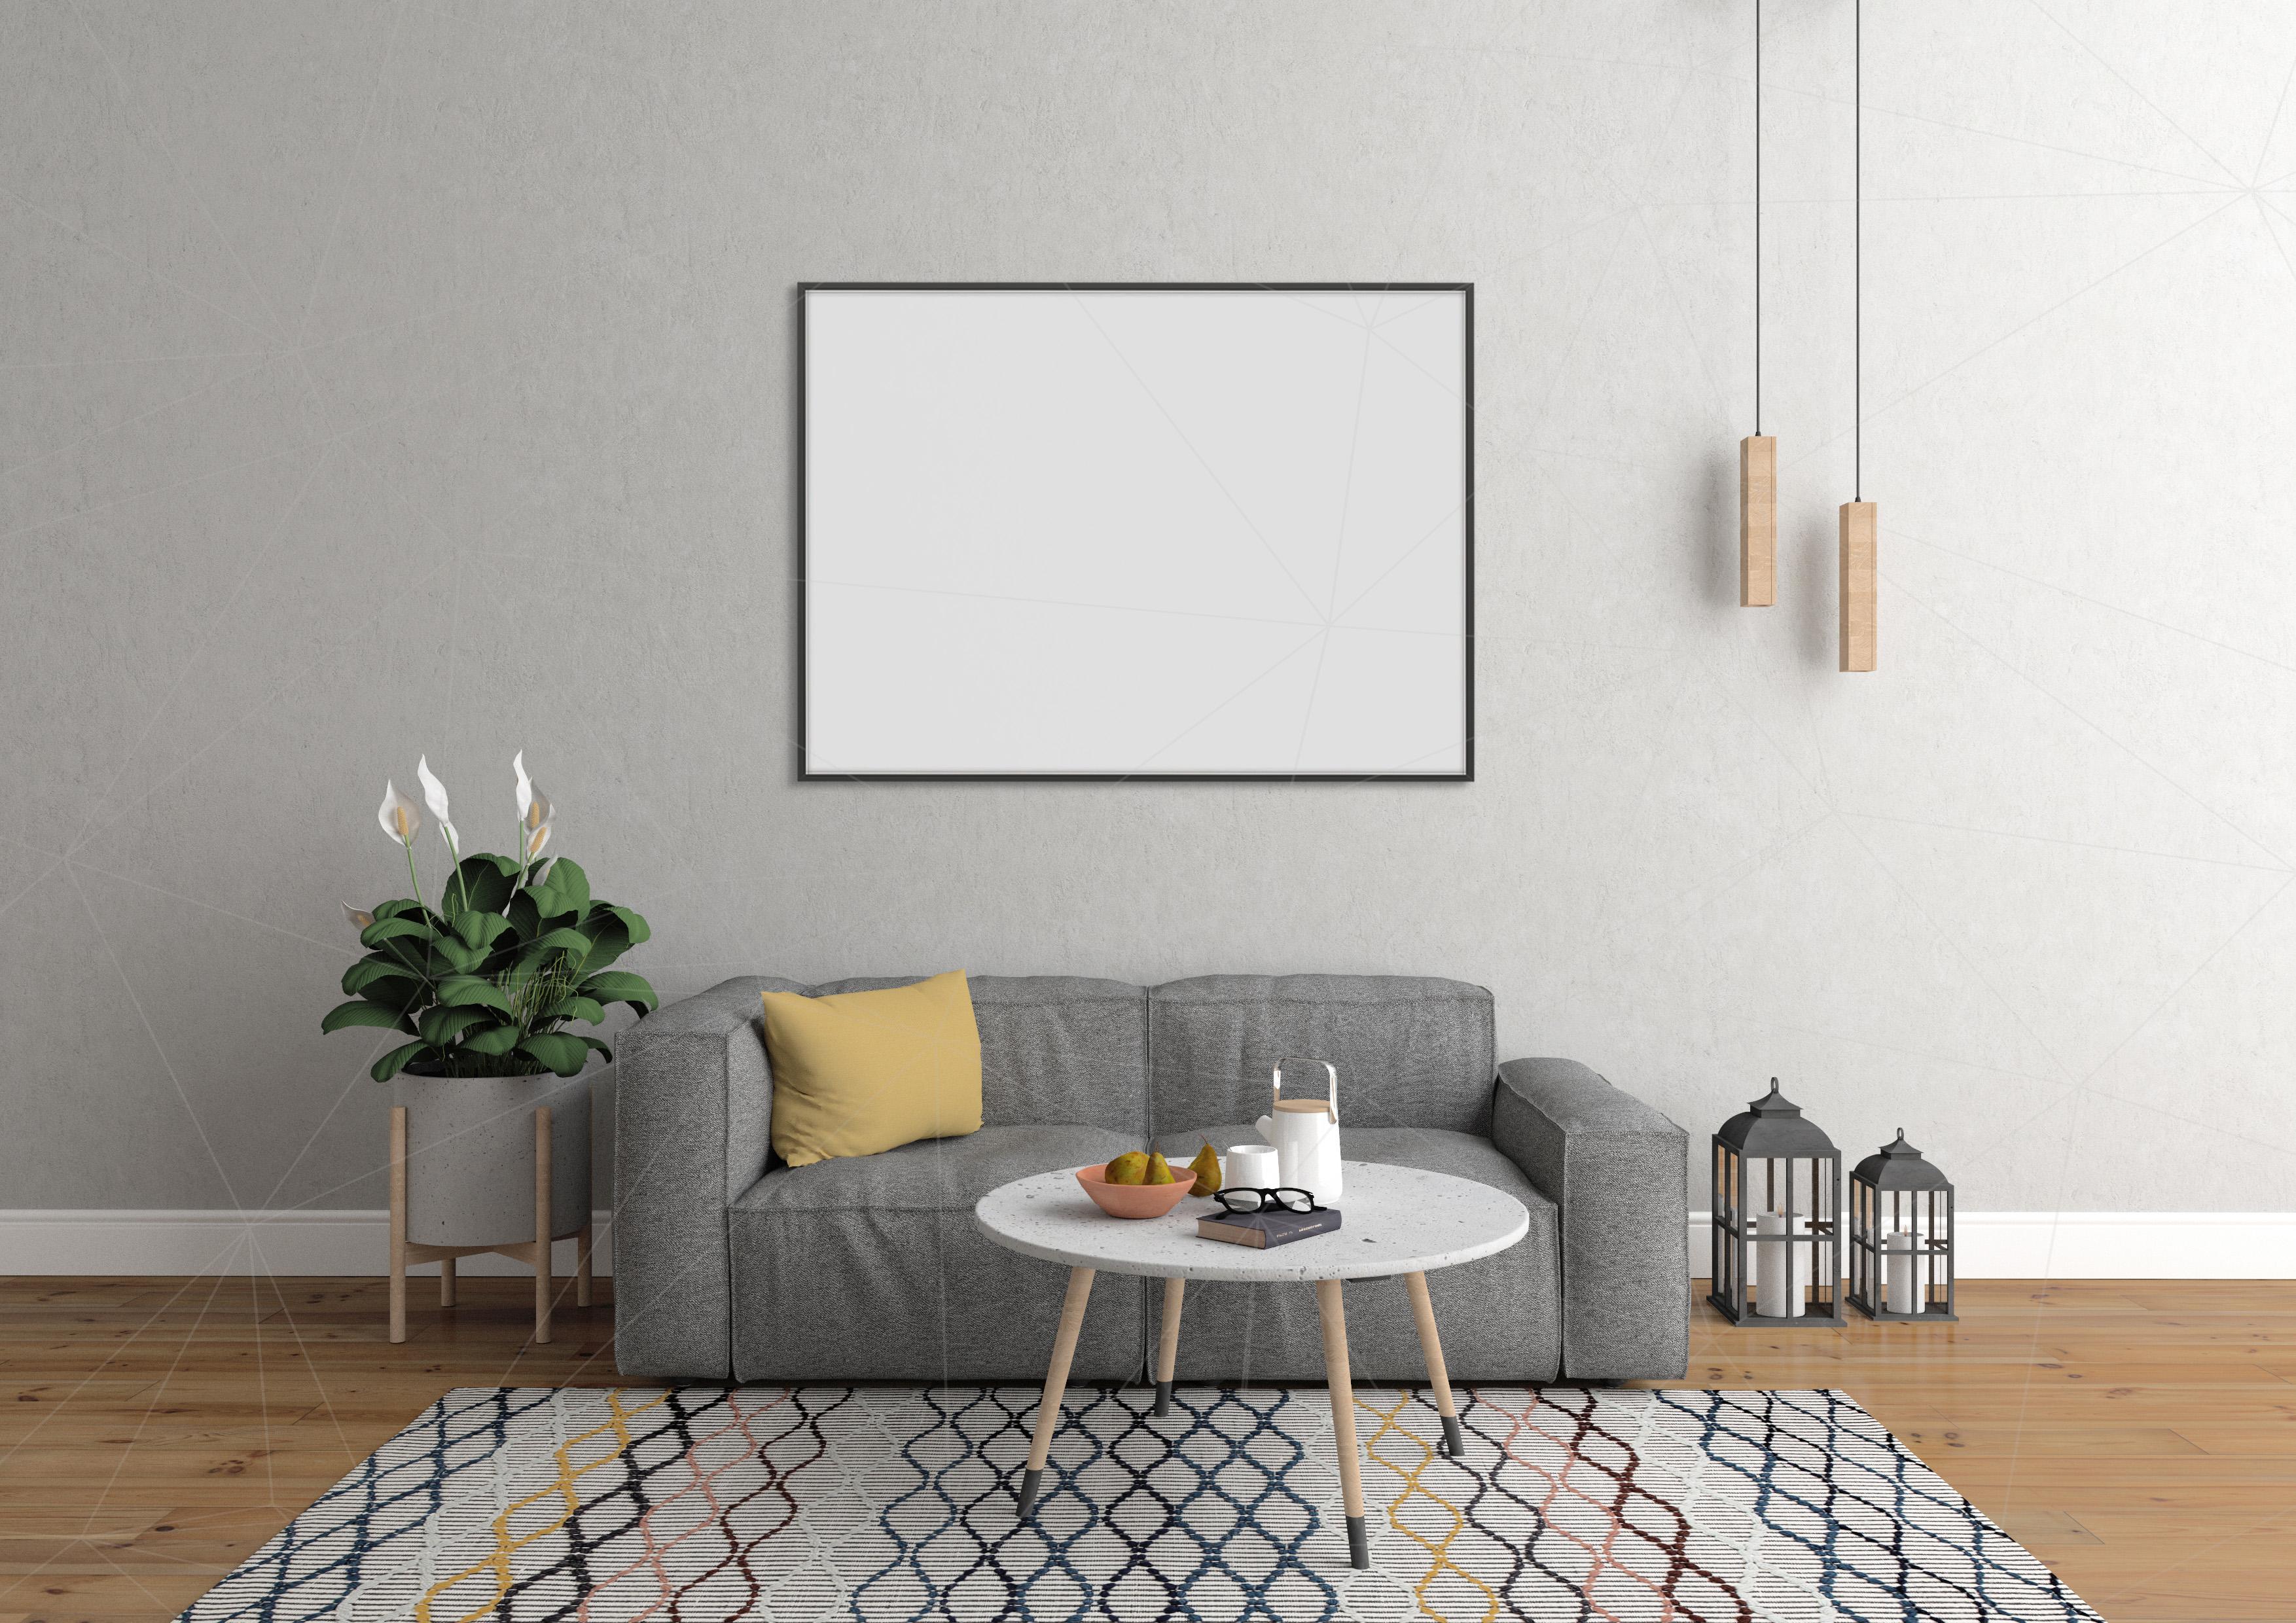 Interior mockup bundle - blank wall mock up example image 1